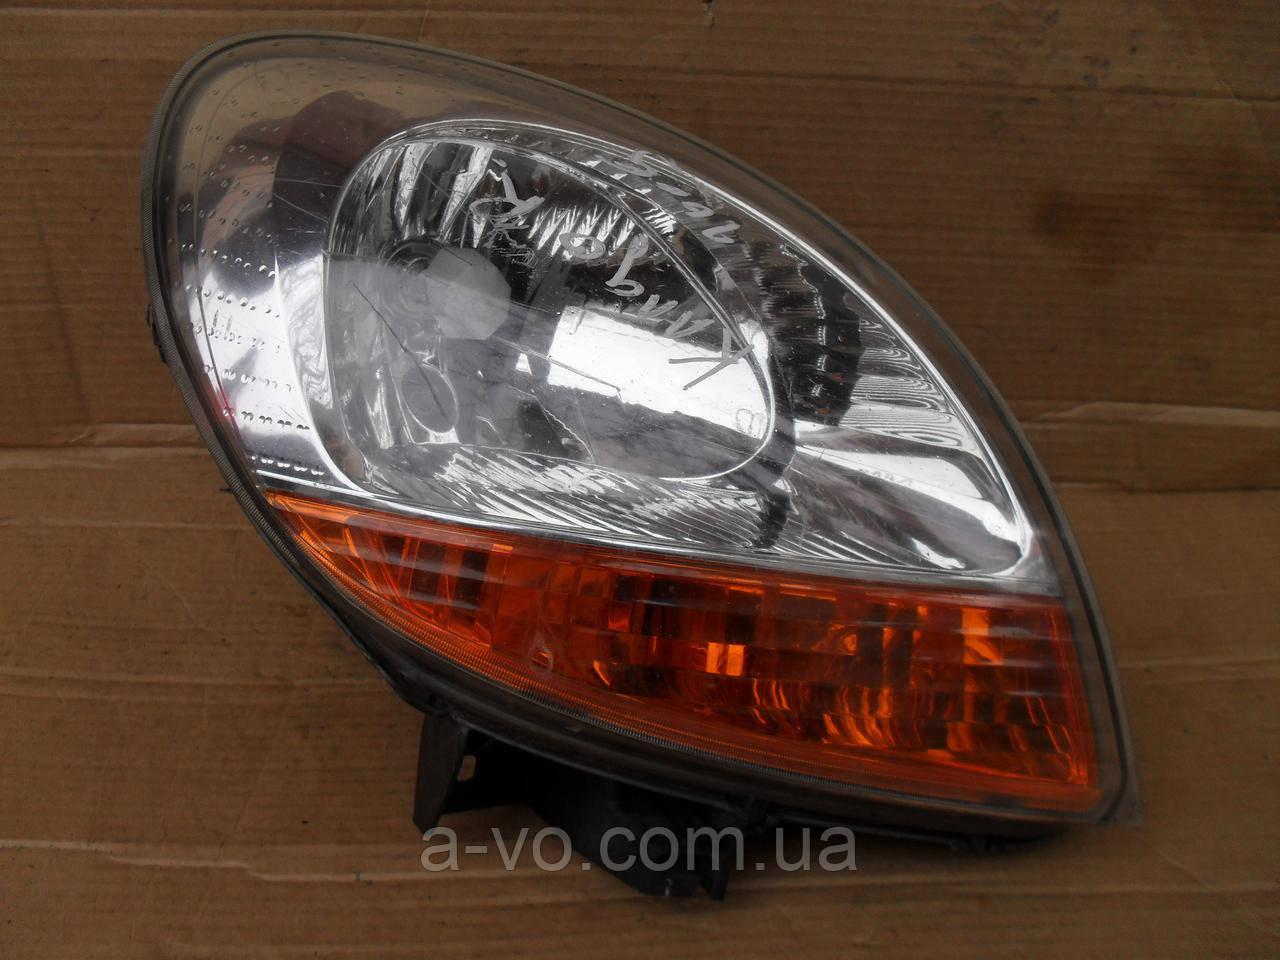 Фара основная права для Renault Kangoo 1, (2003-2005) Valeo 8200150617, 89008436, 89008680, 89027229